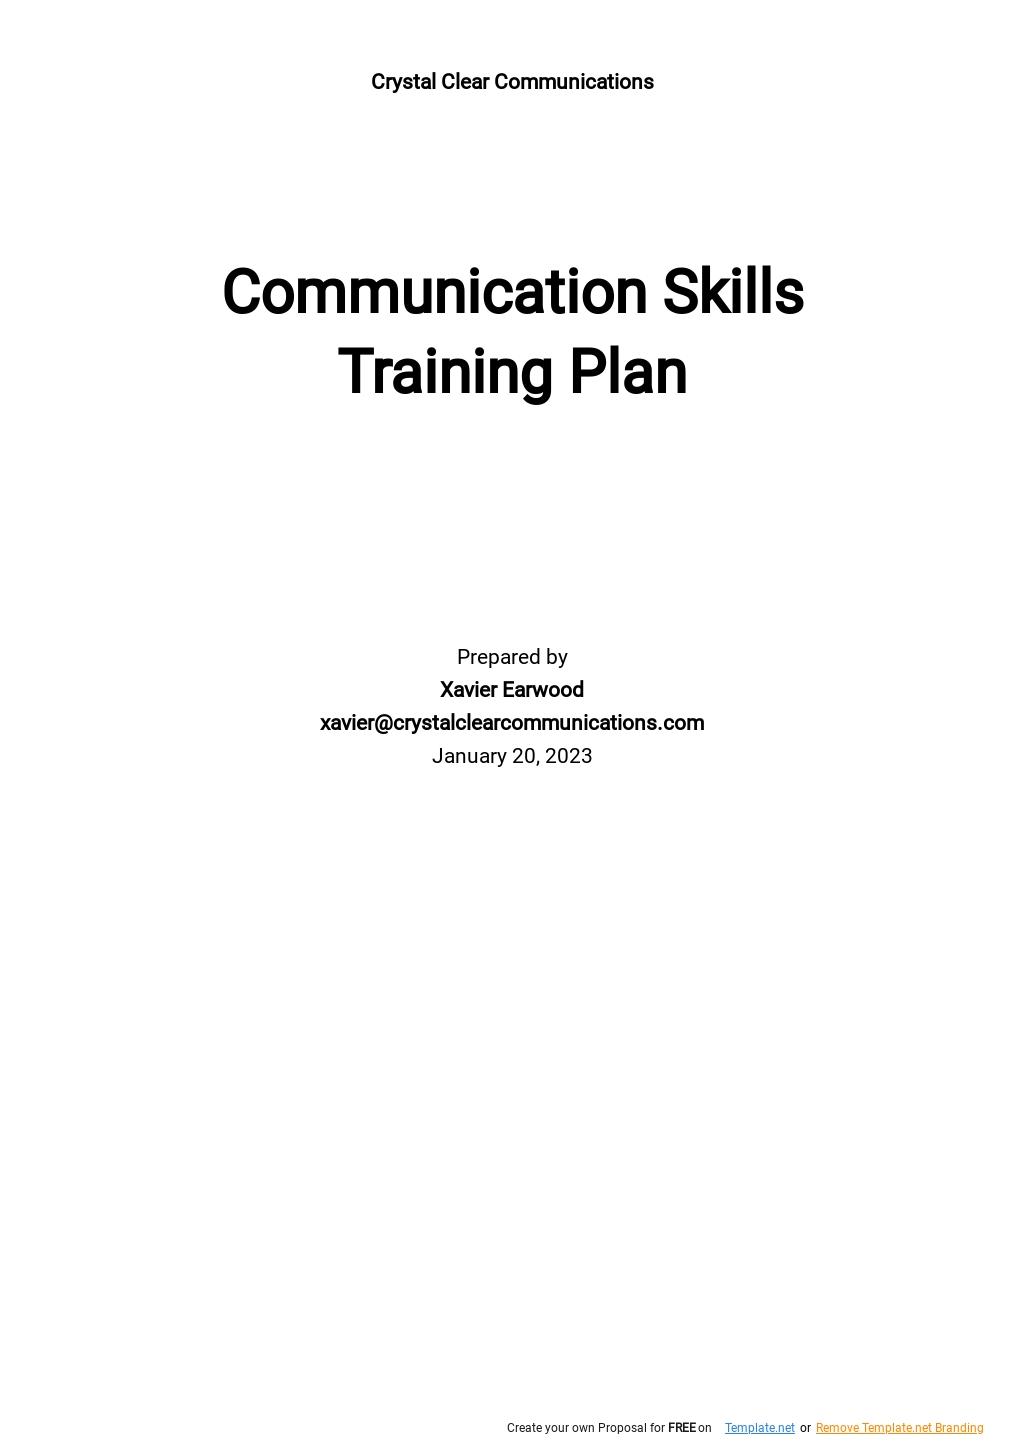 Training Plan Template.jpe